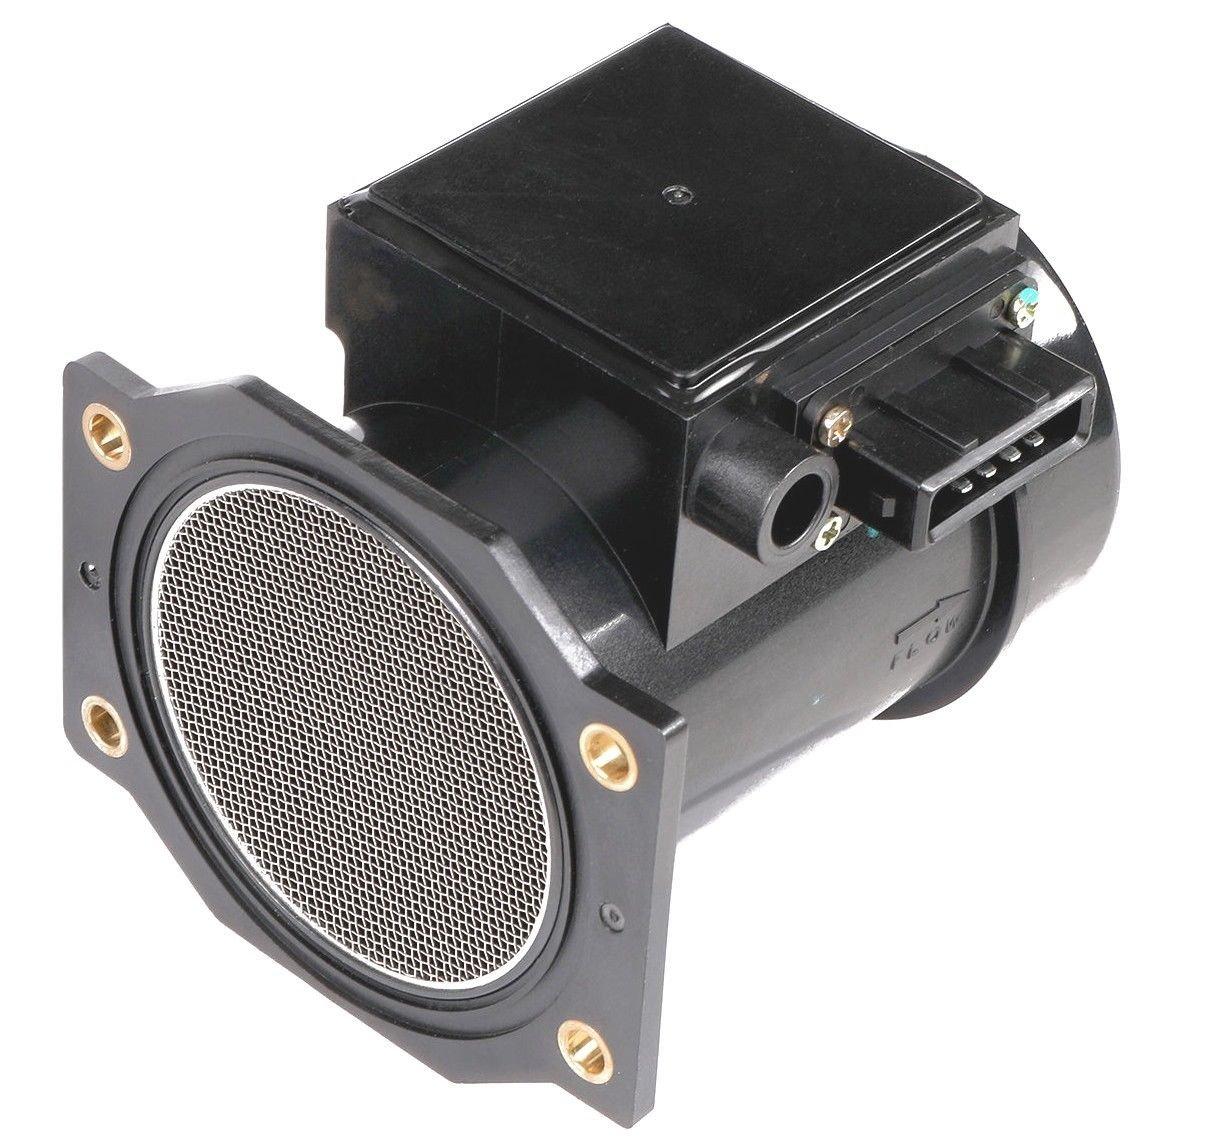 Old Driver 4 PIN Mass Air Flow Sensor MAF AFM 22680-30P00 2268030P00 For 1990 1991 1992 1993 1994 1995 1996 Nissan Infiniti 300 ZX (Z32) J30 3.0 L V6